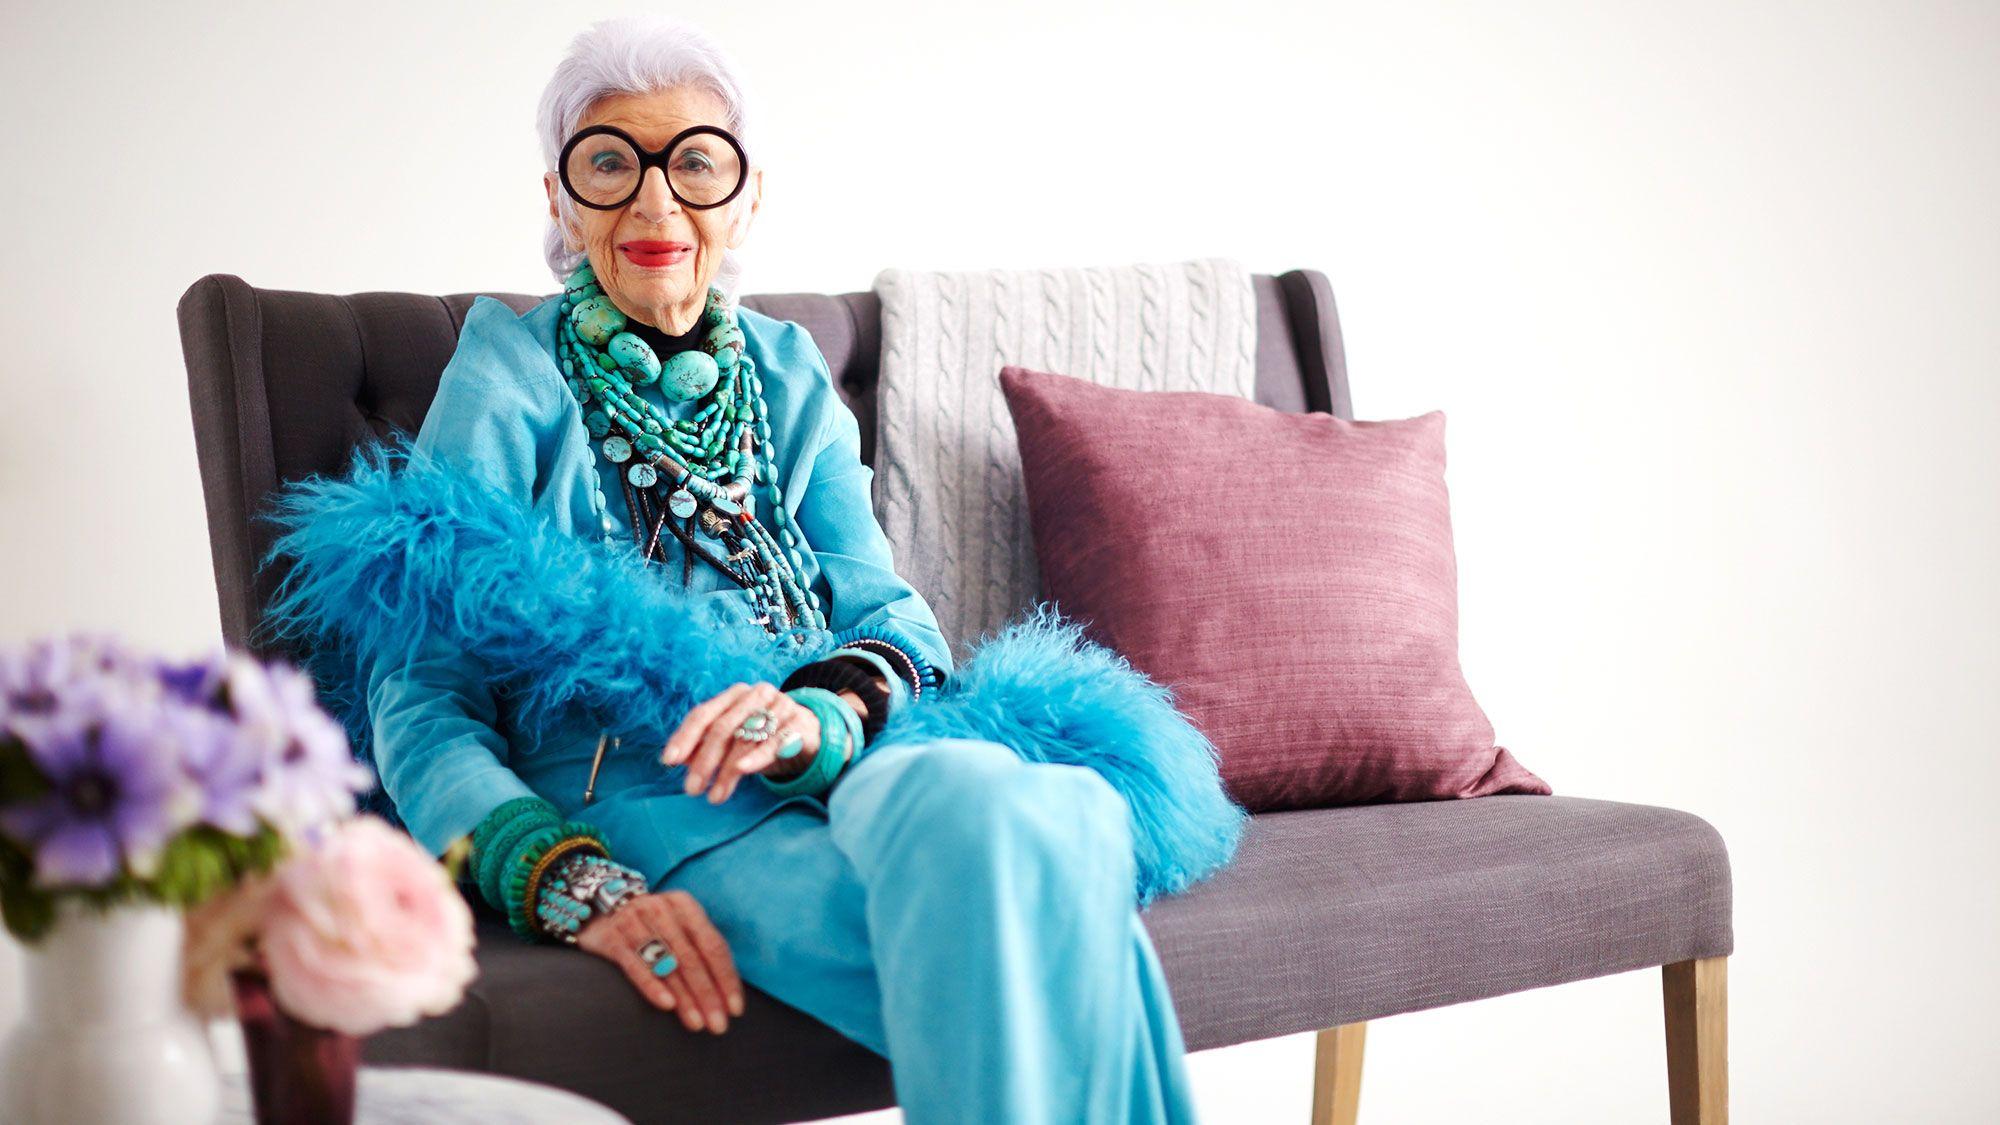 Iris Apfel on Being a Geriatric Starlet and Selling Her Vintage Treasures